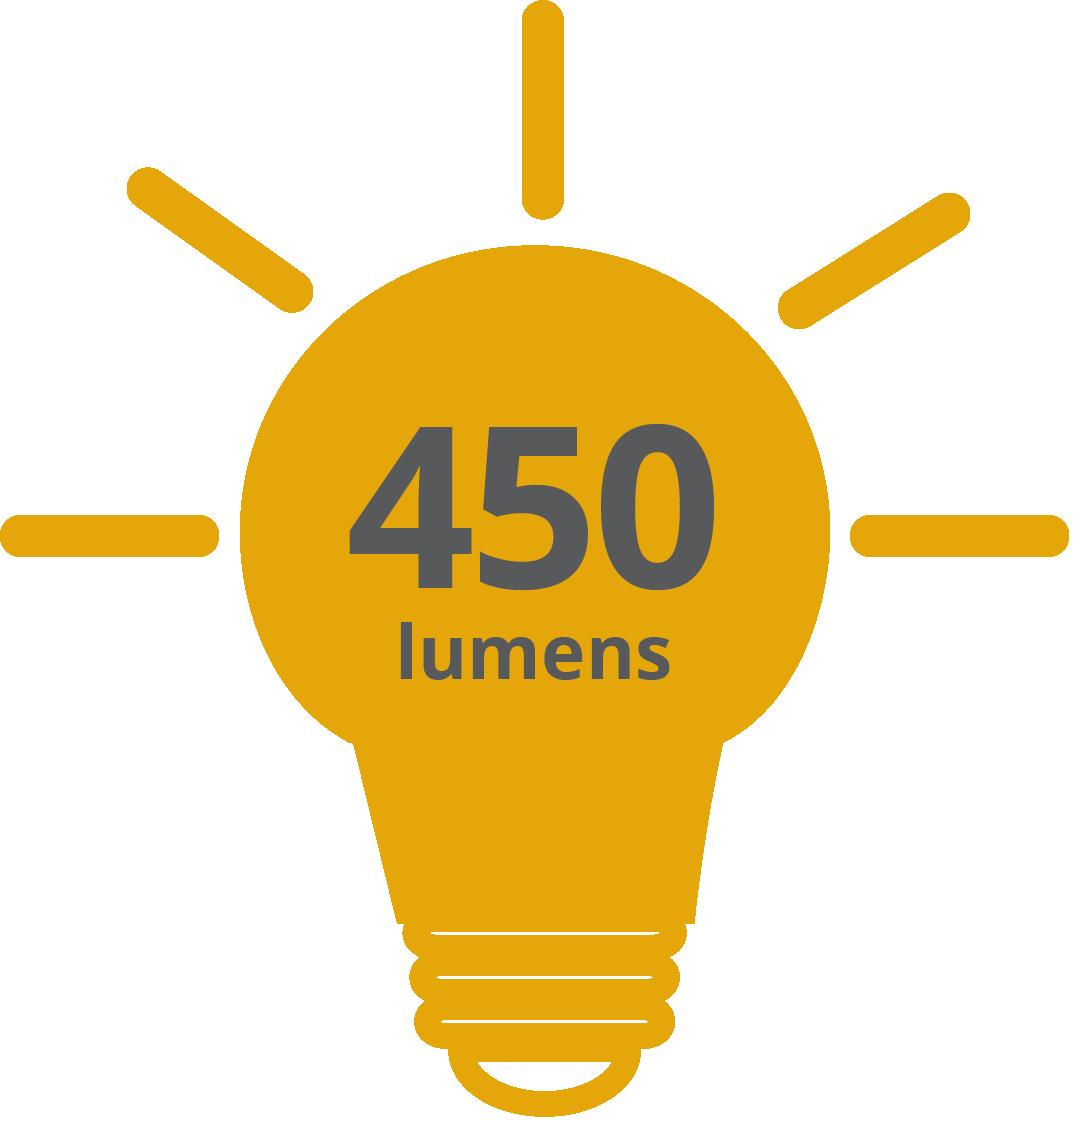 l406g2527k-lumens.png